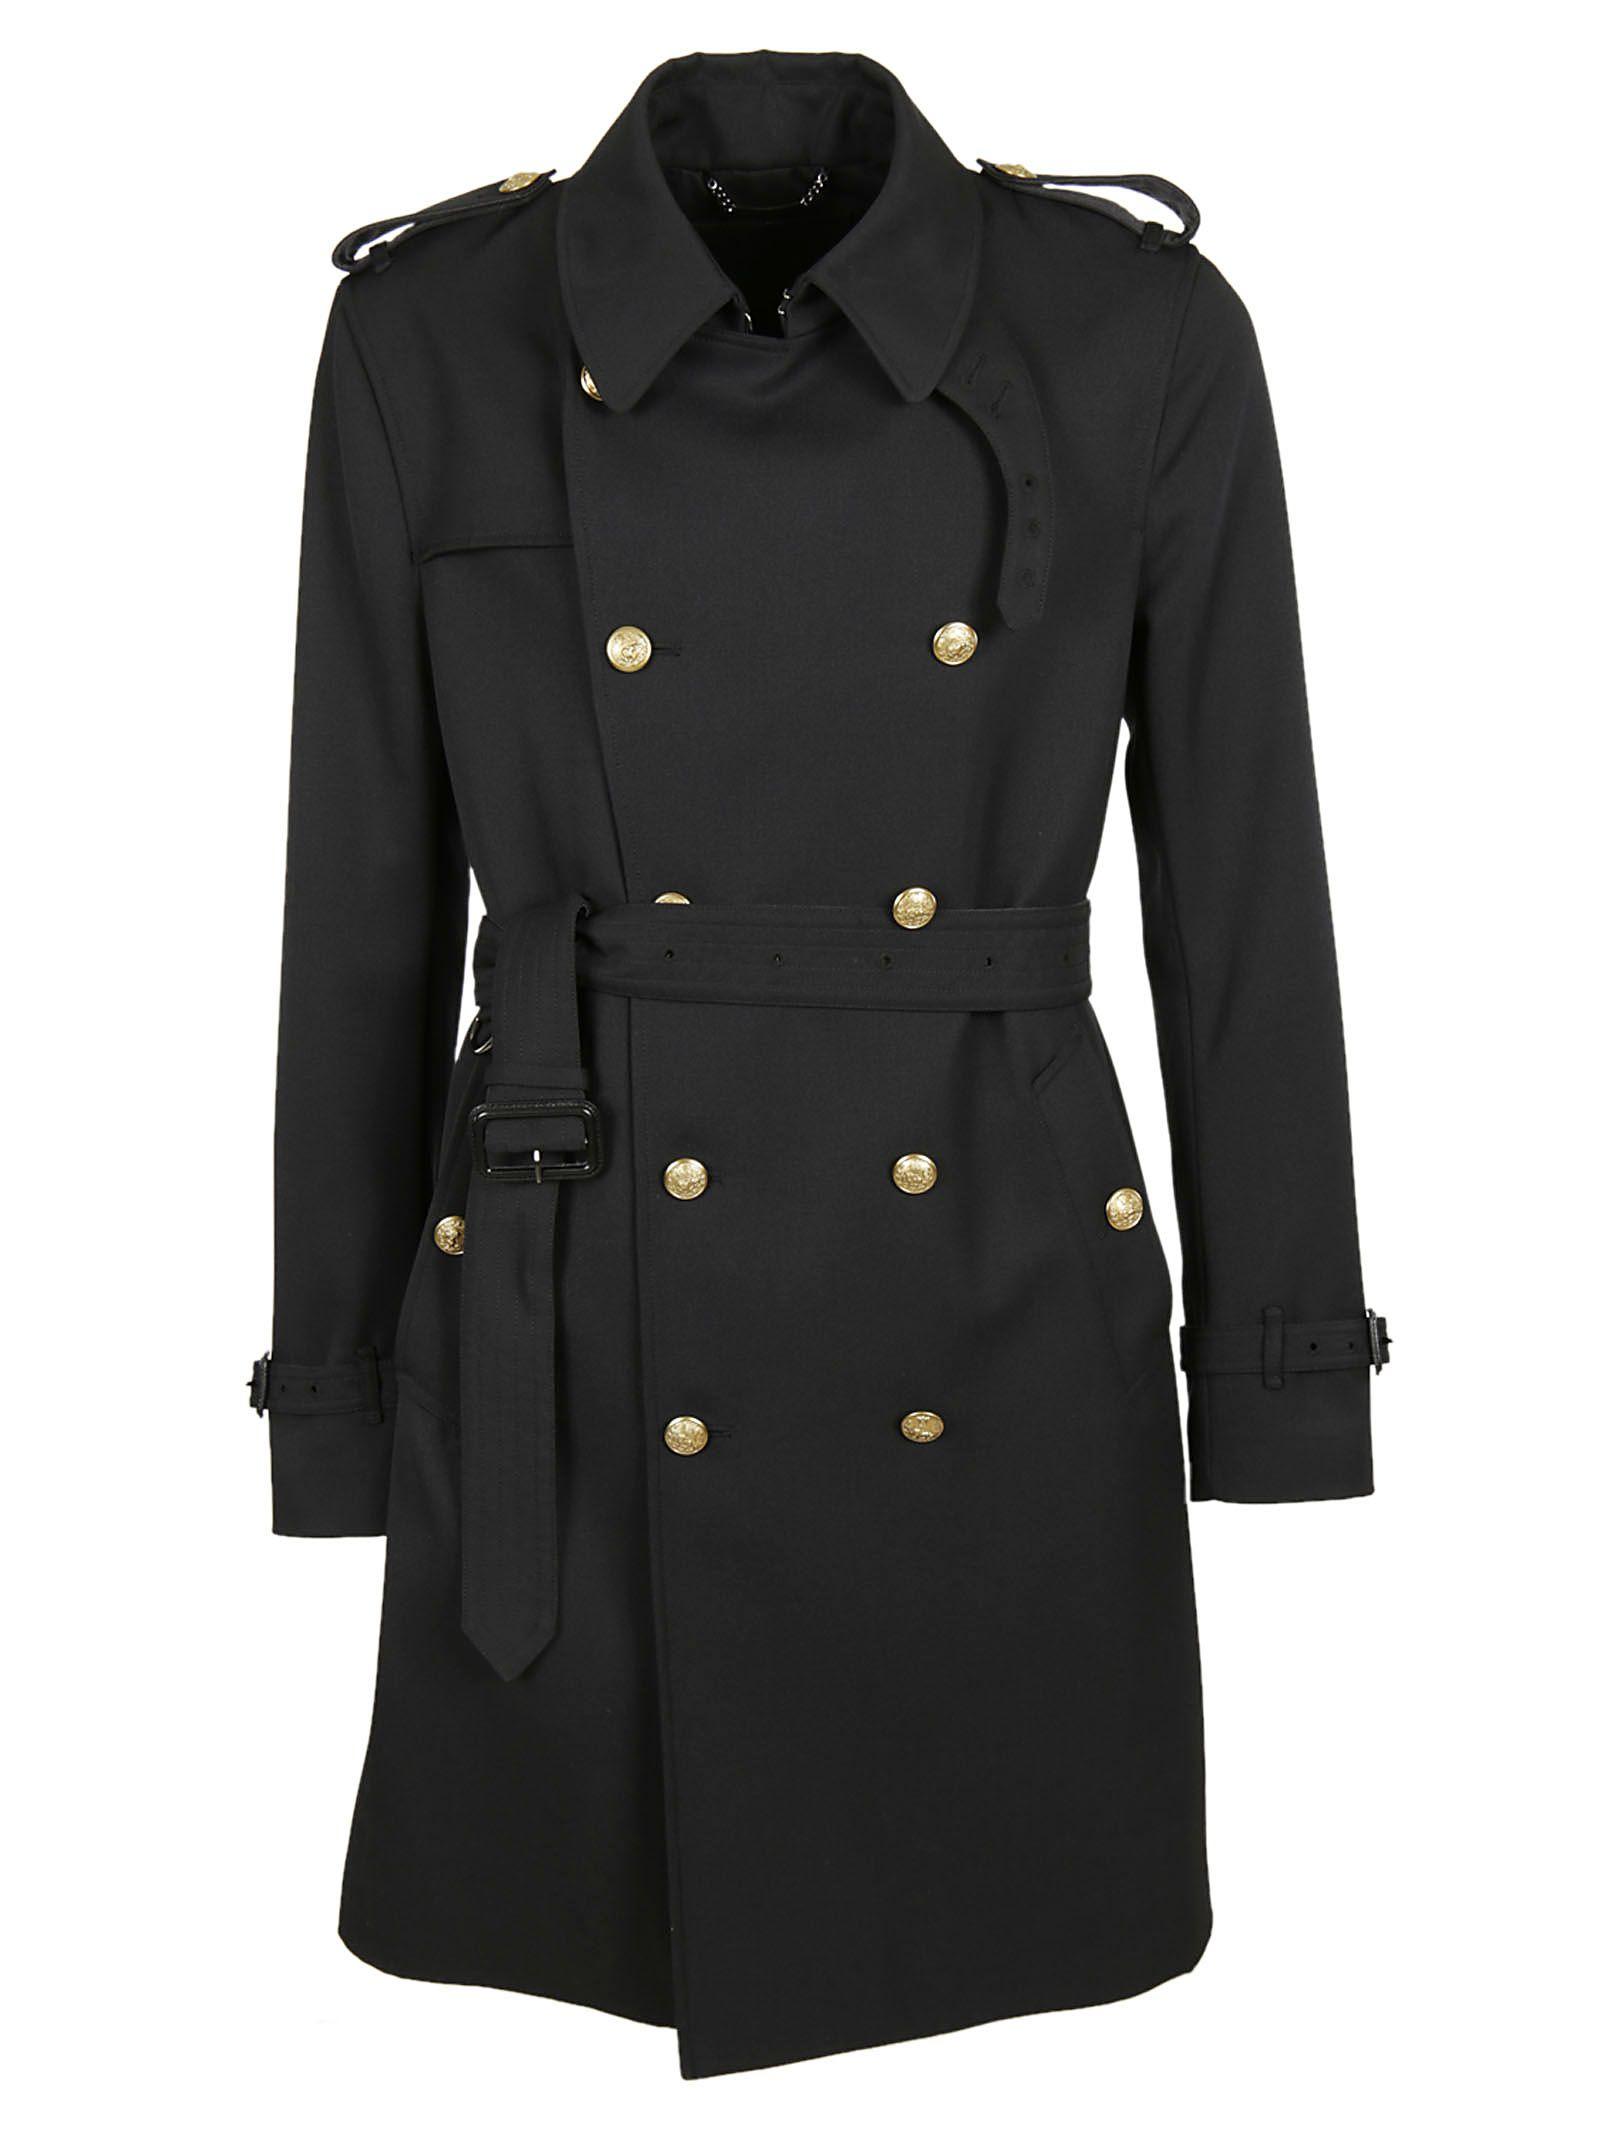 dolce gabbana dolce gabbana classic trench nero men 39 s raincoats italist. Black Bedroom Furniture Sets. Home Design Ideas